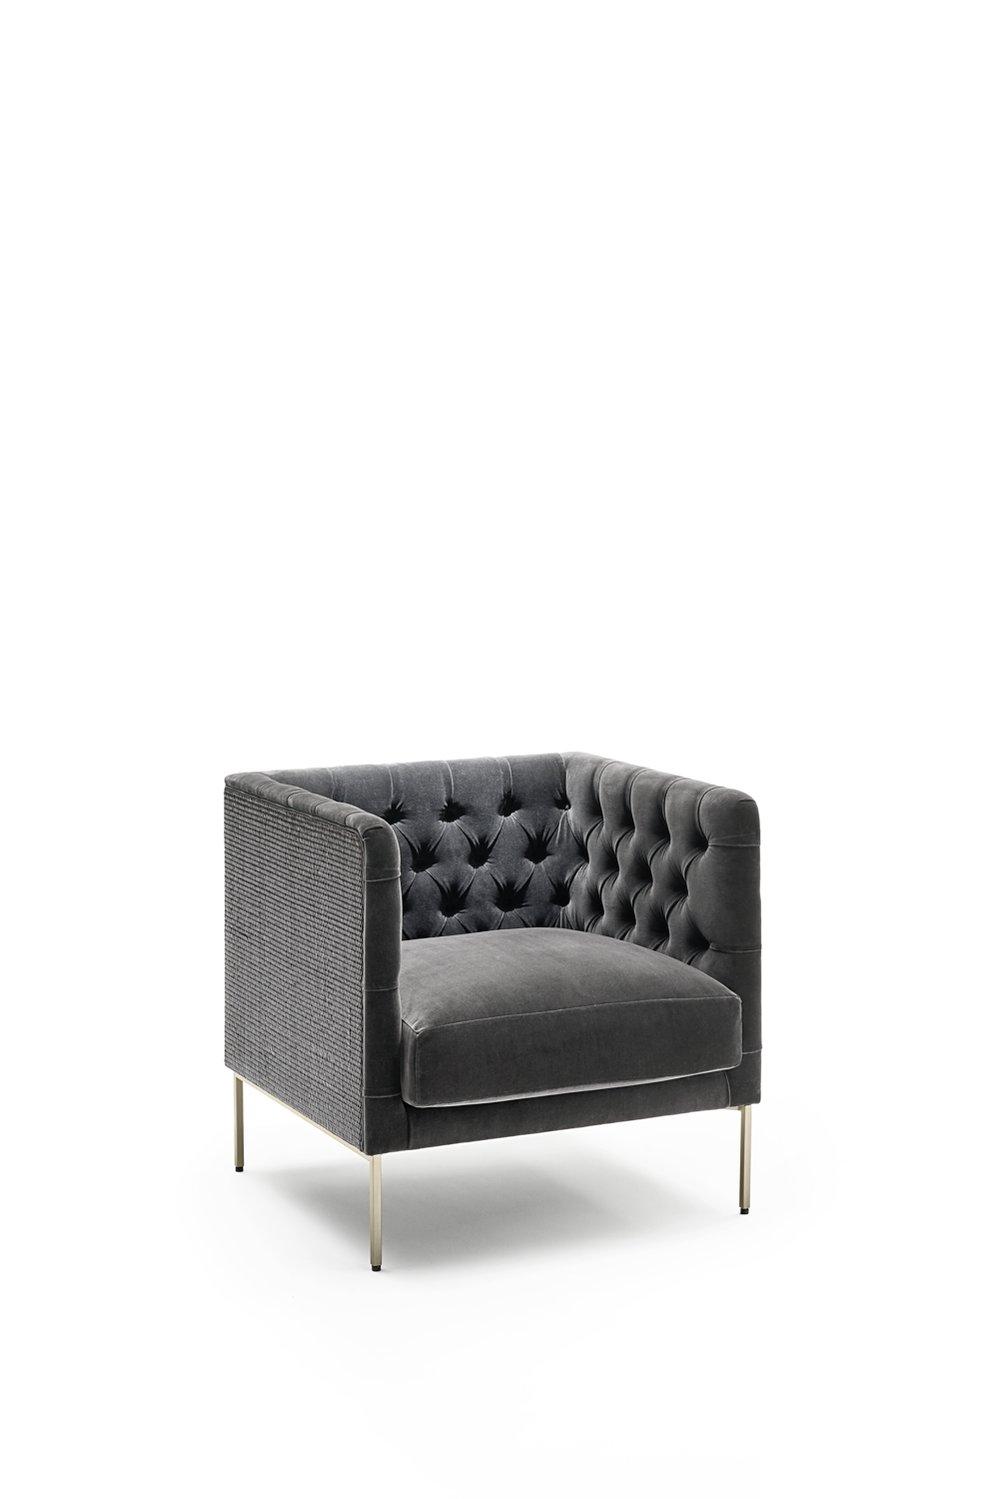 LivingDivani_Lipp_armchair_WEB.jpg